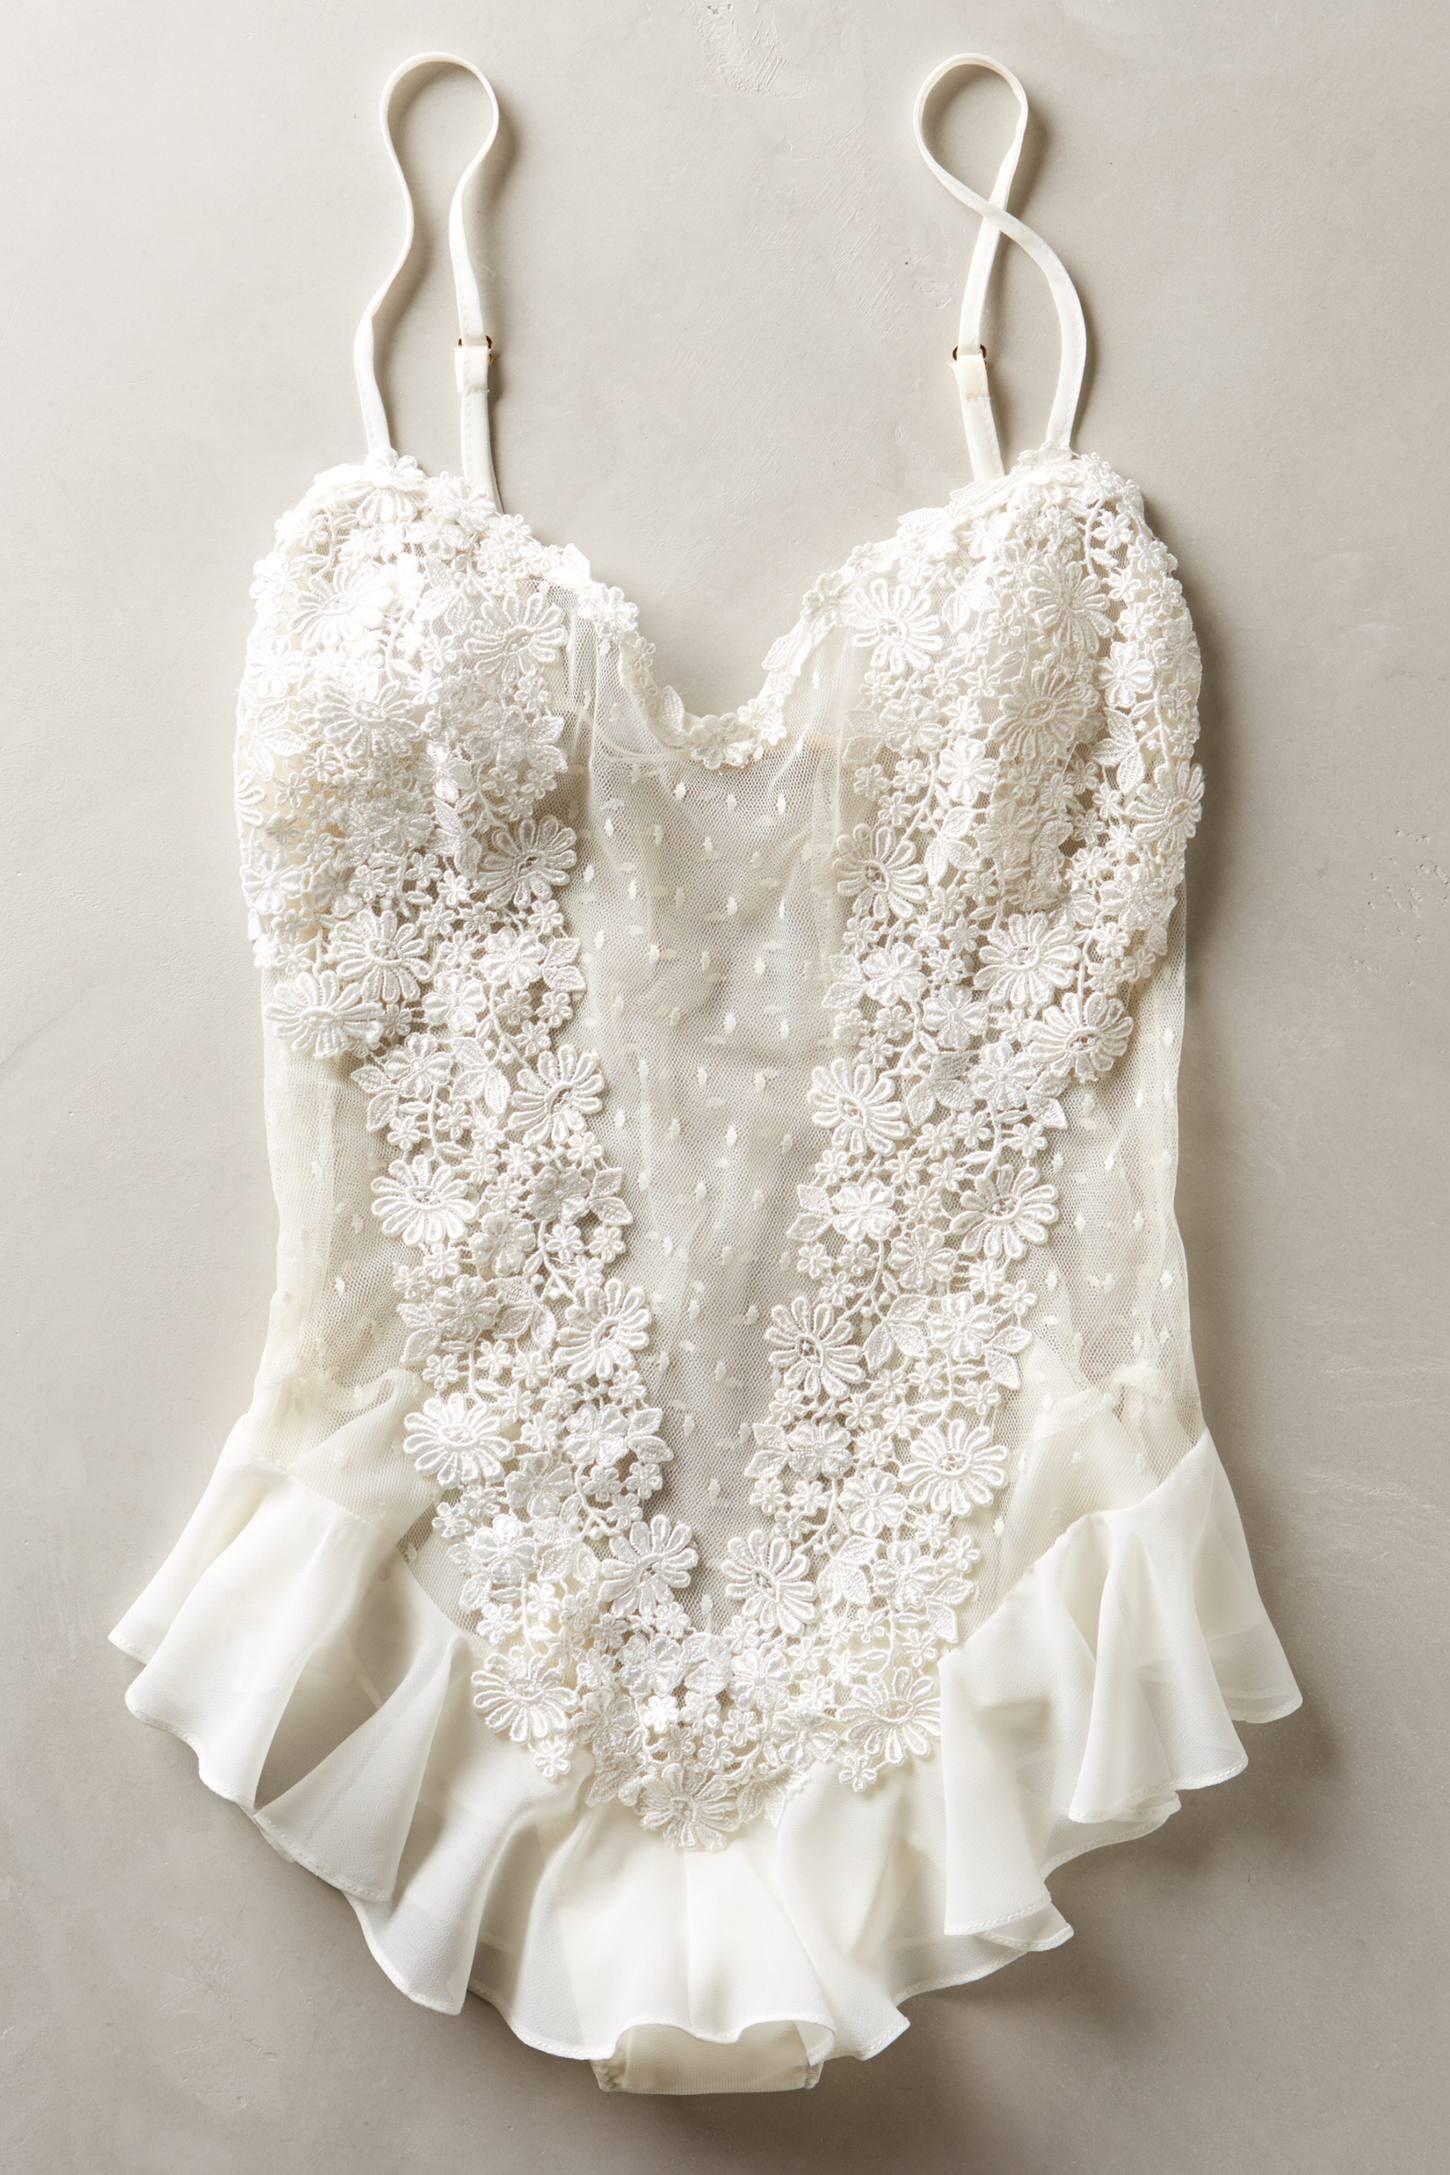 "<p>Flora Nikrooz Fluer Flutter Bodysuit, $112; <a target=""_blank"" href=""http://www.anthropologie.com/anthro/product/clothes-intimates/33356346.jsp#/"">anthropologie.com</a></p>"